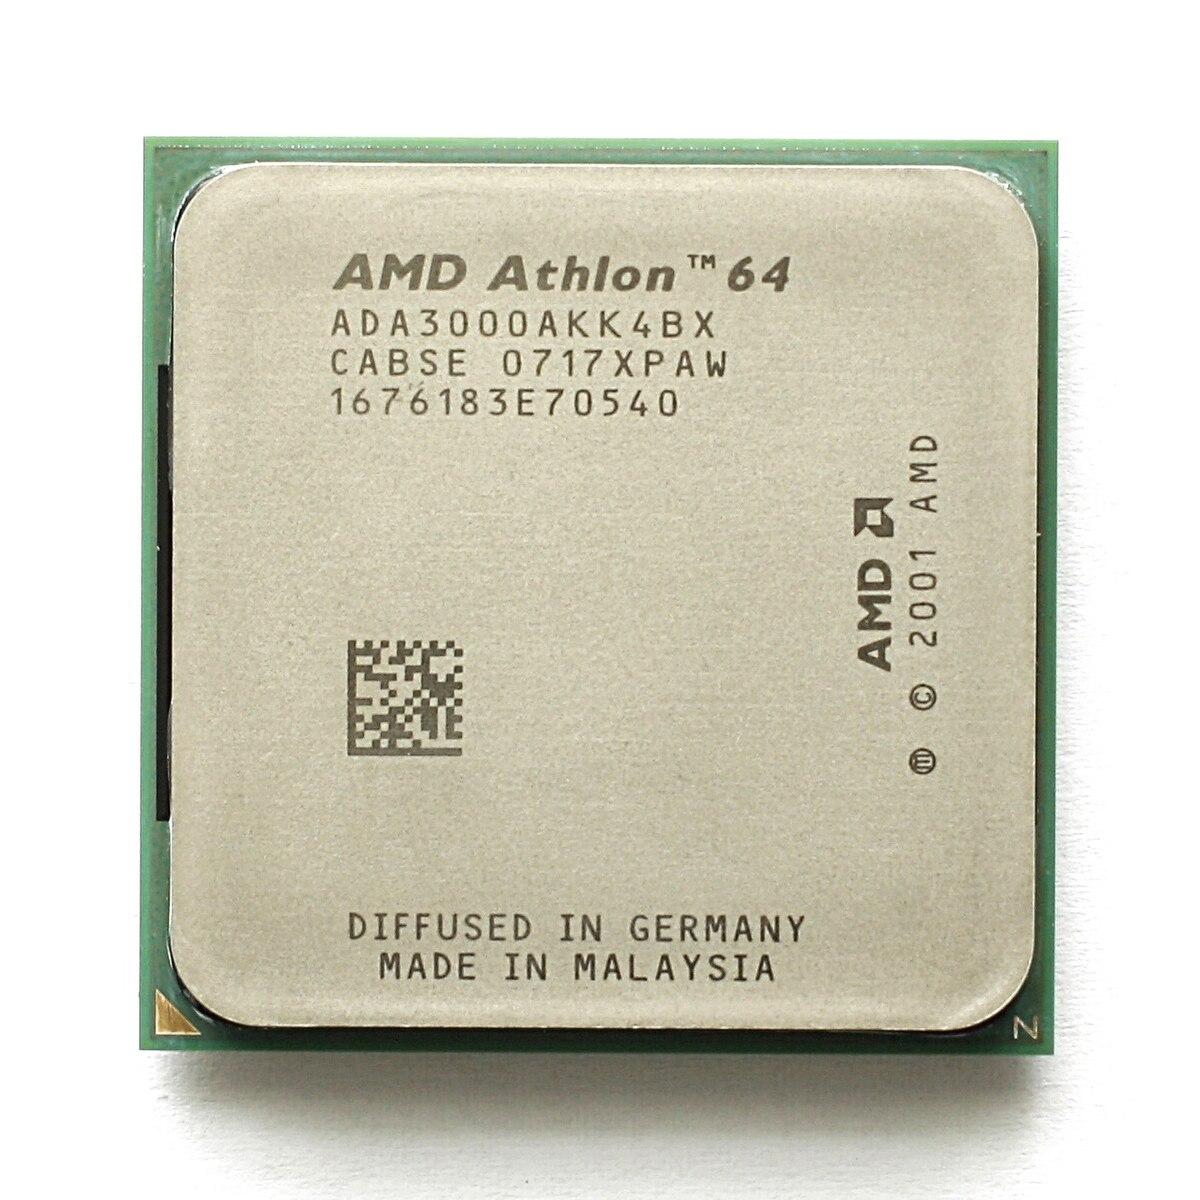 1280x1024 amd athlon 64 - photo #17